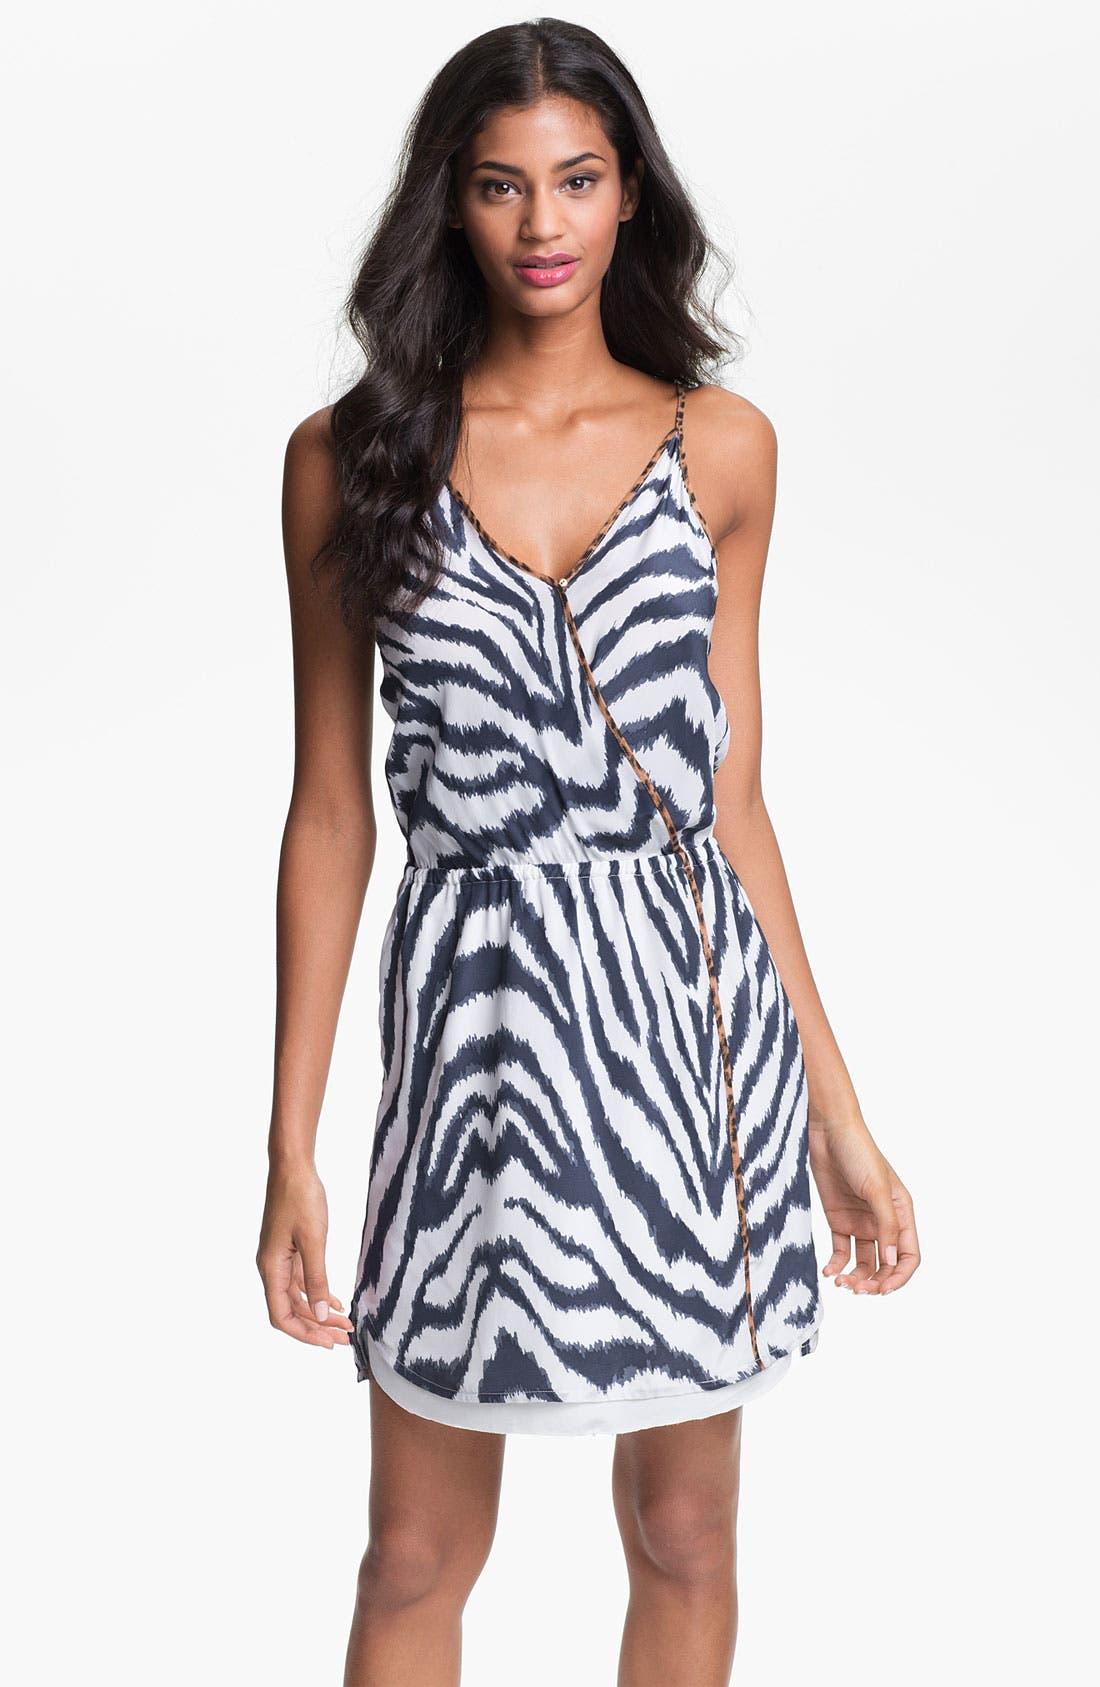 Main Image - ViX Swimwear 'Cape Navy Rachel' Cover-Up Dress